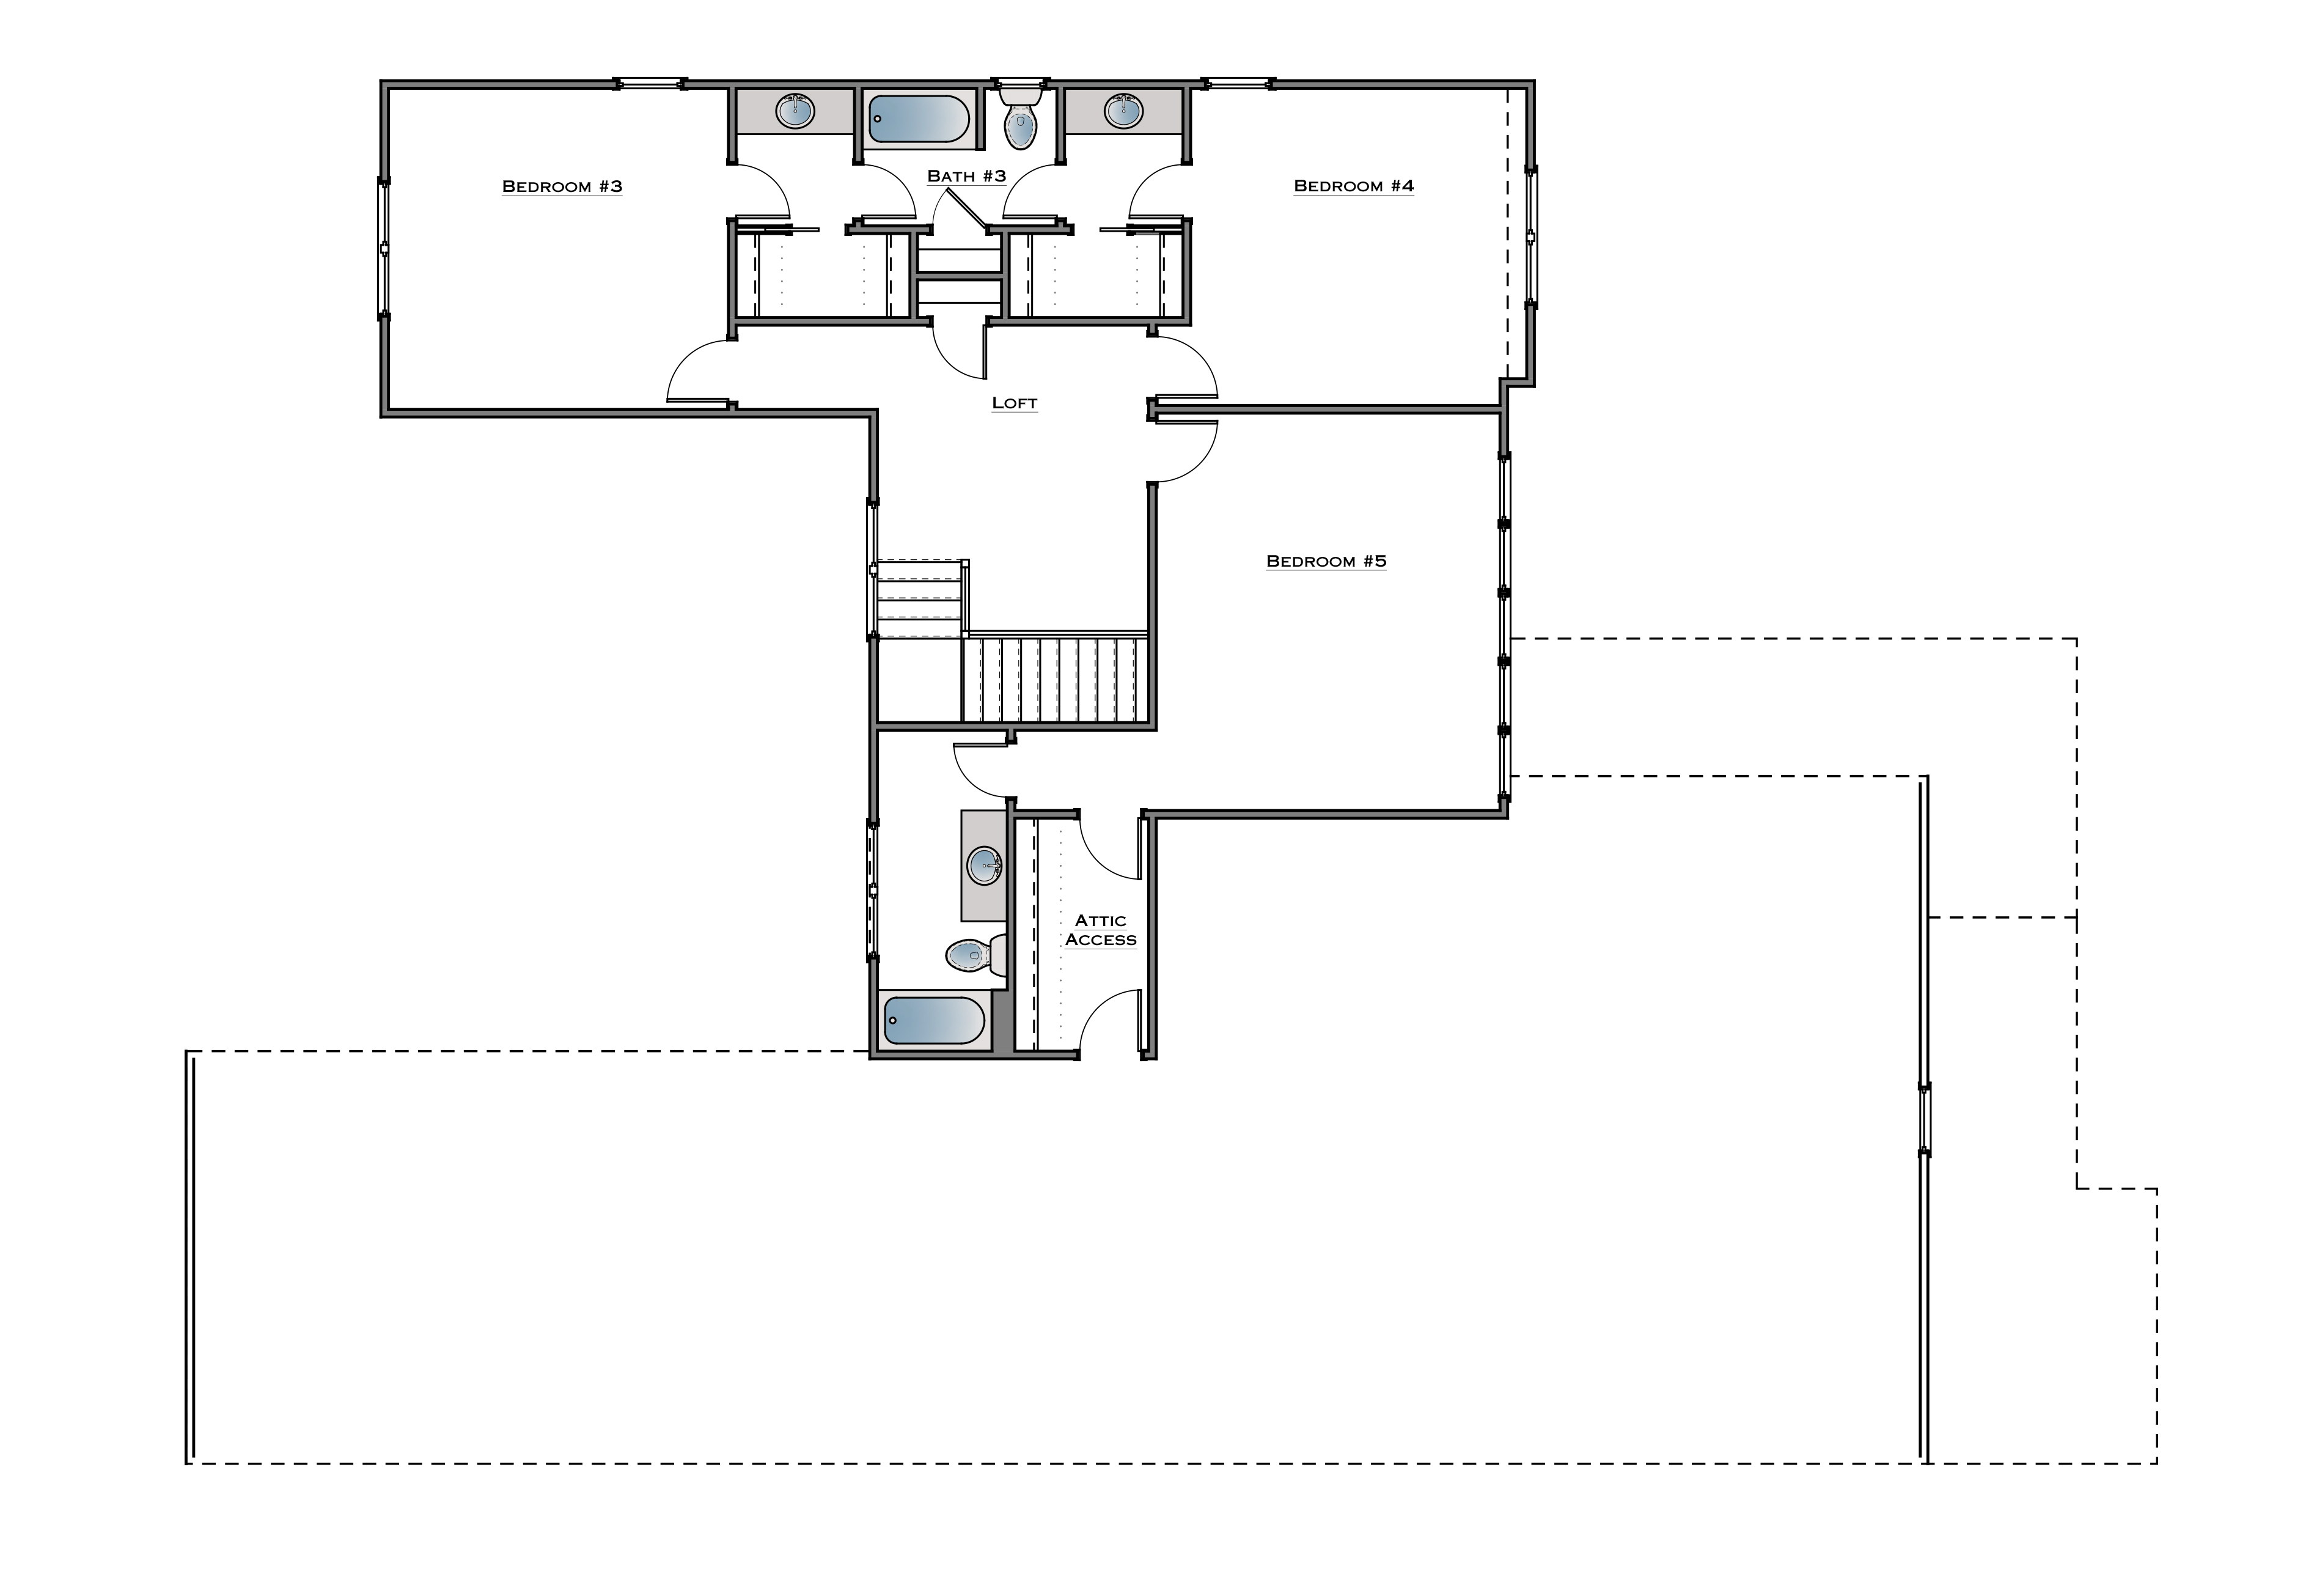 Lot 2 - 2nd Level